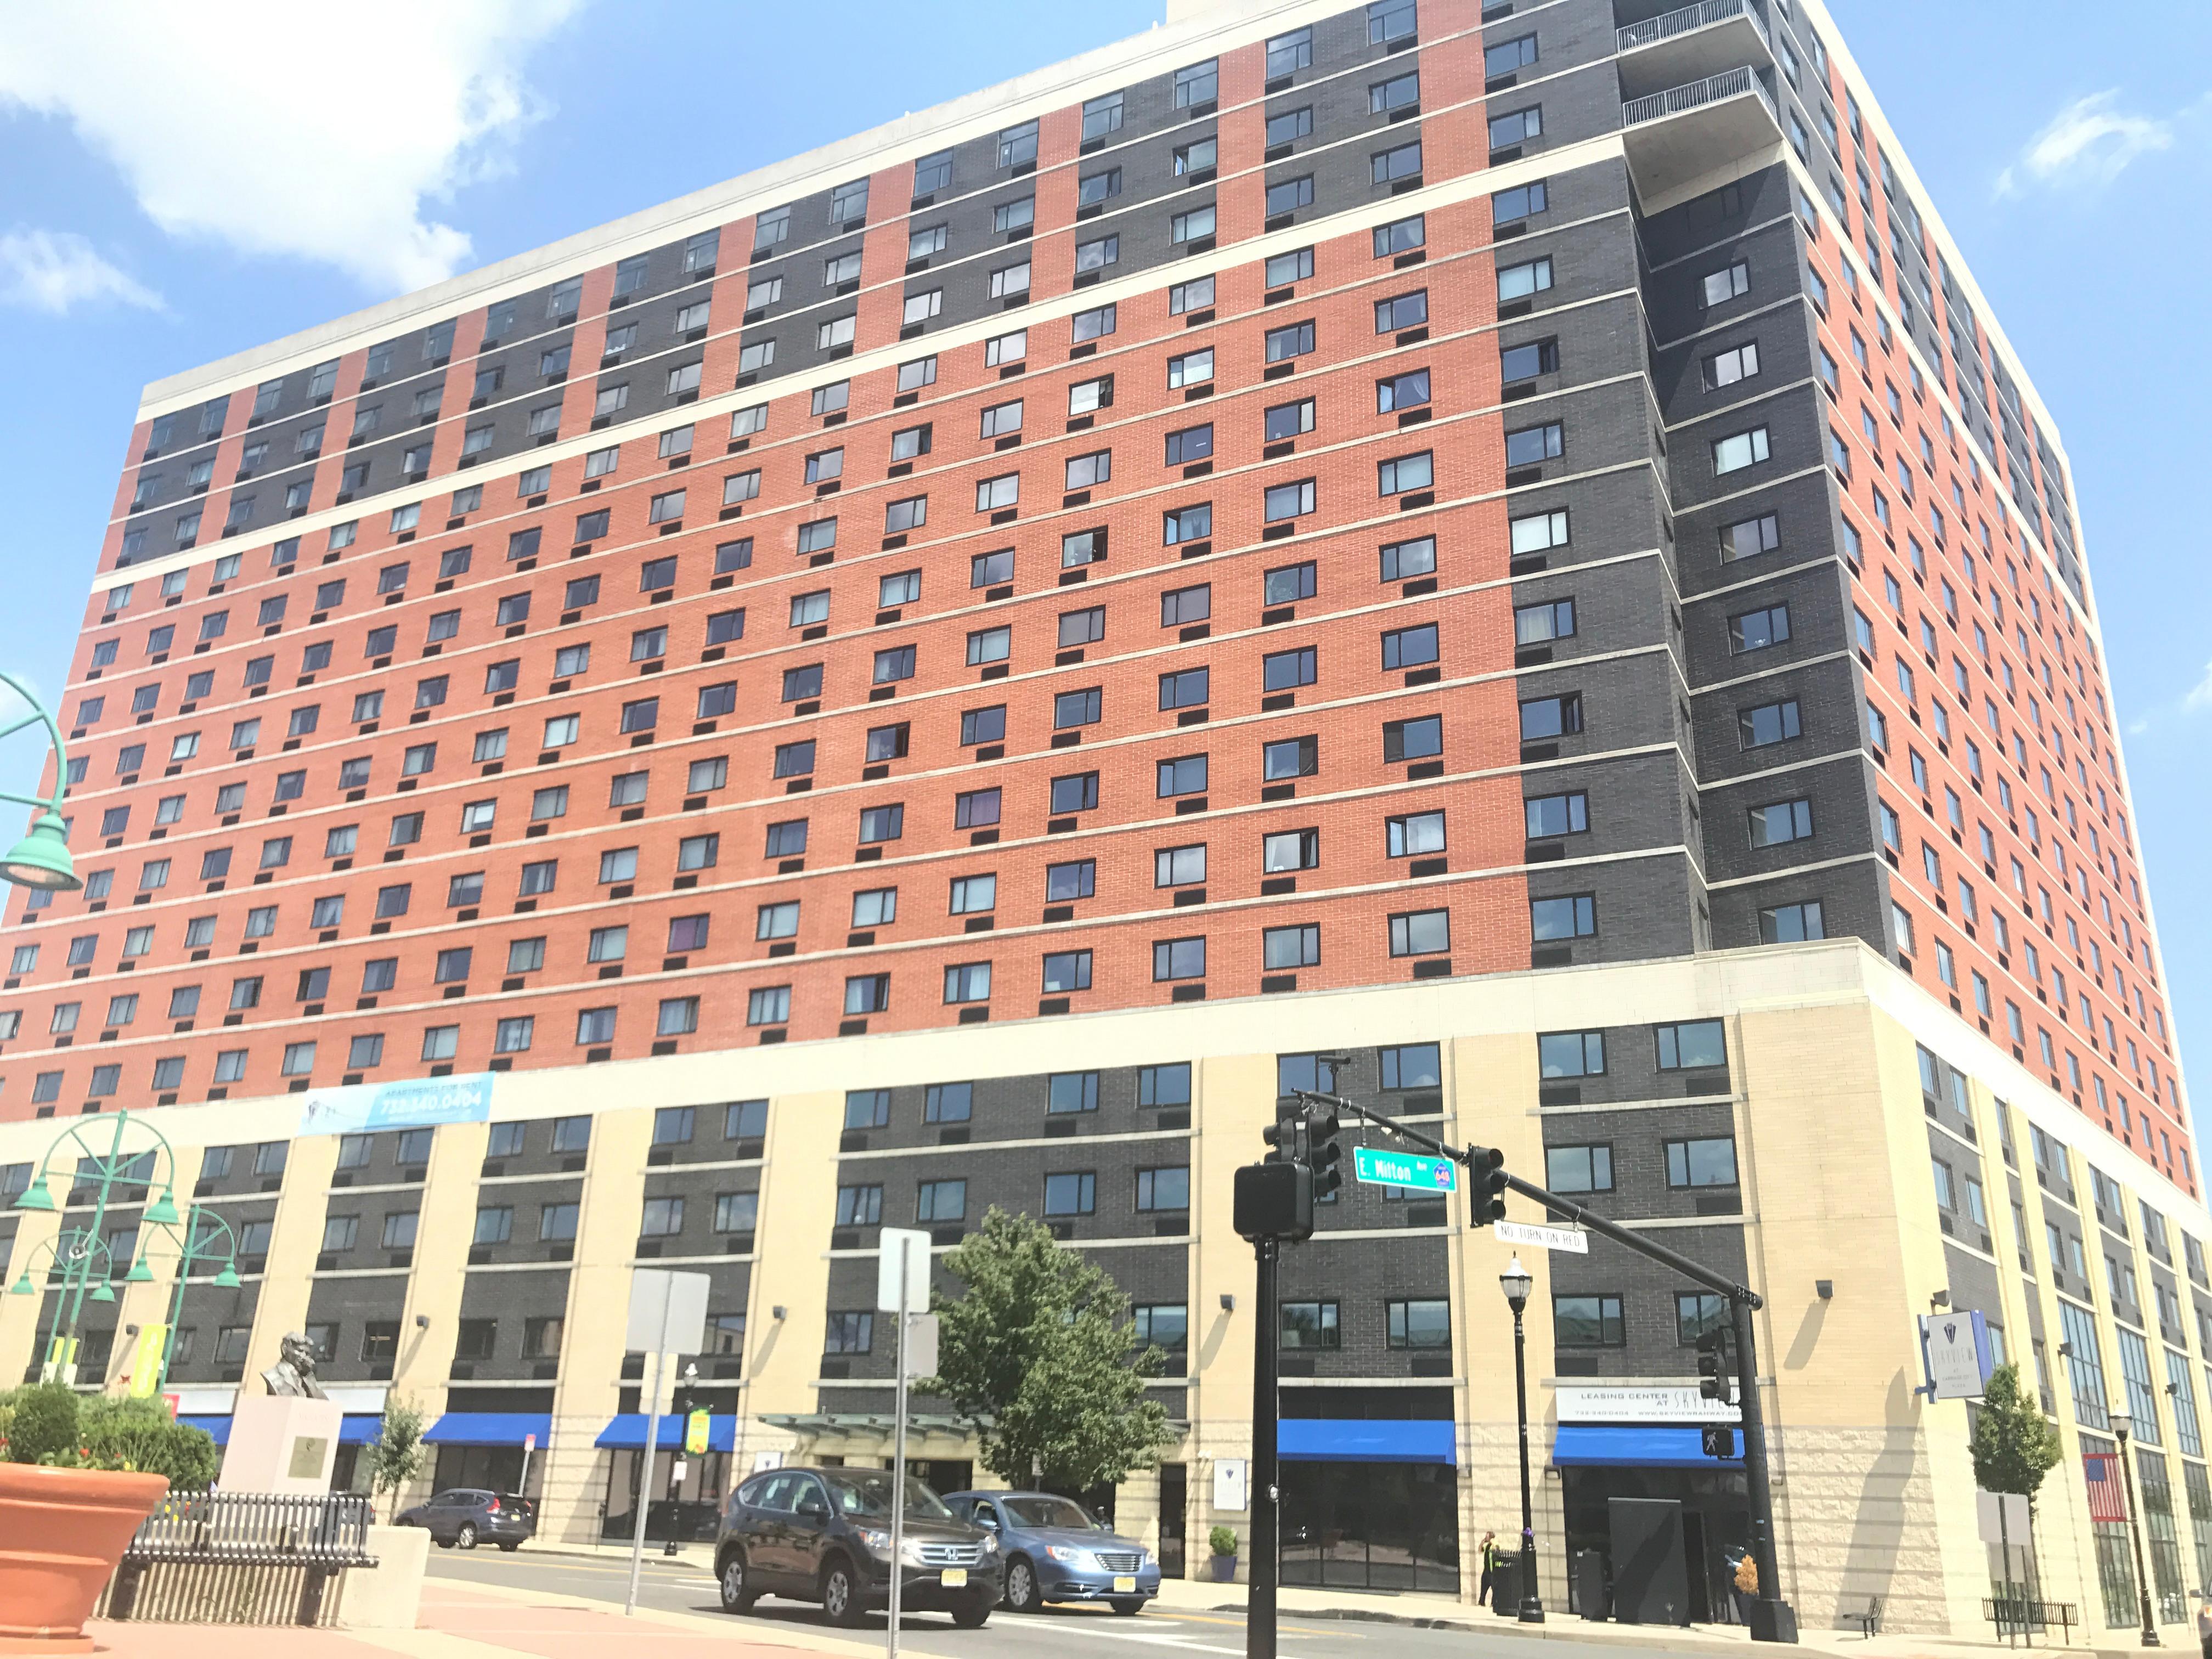 Watt Hotel image 6